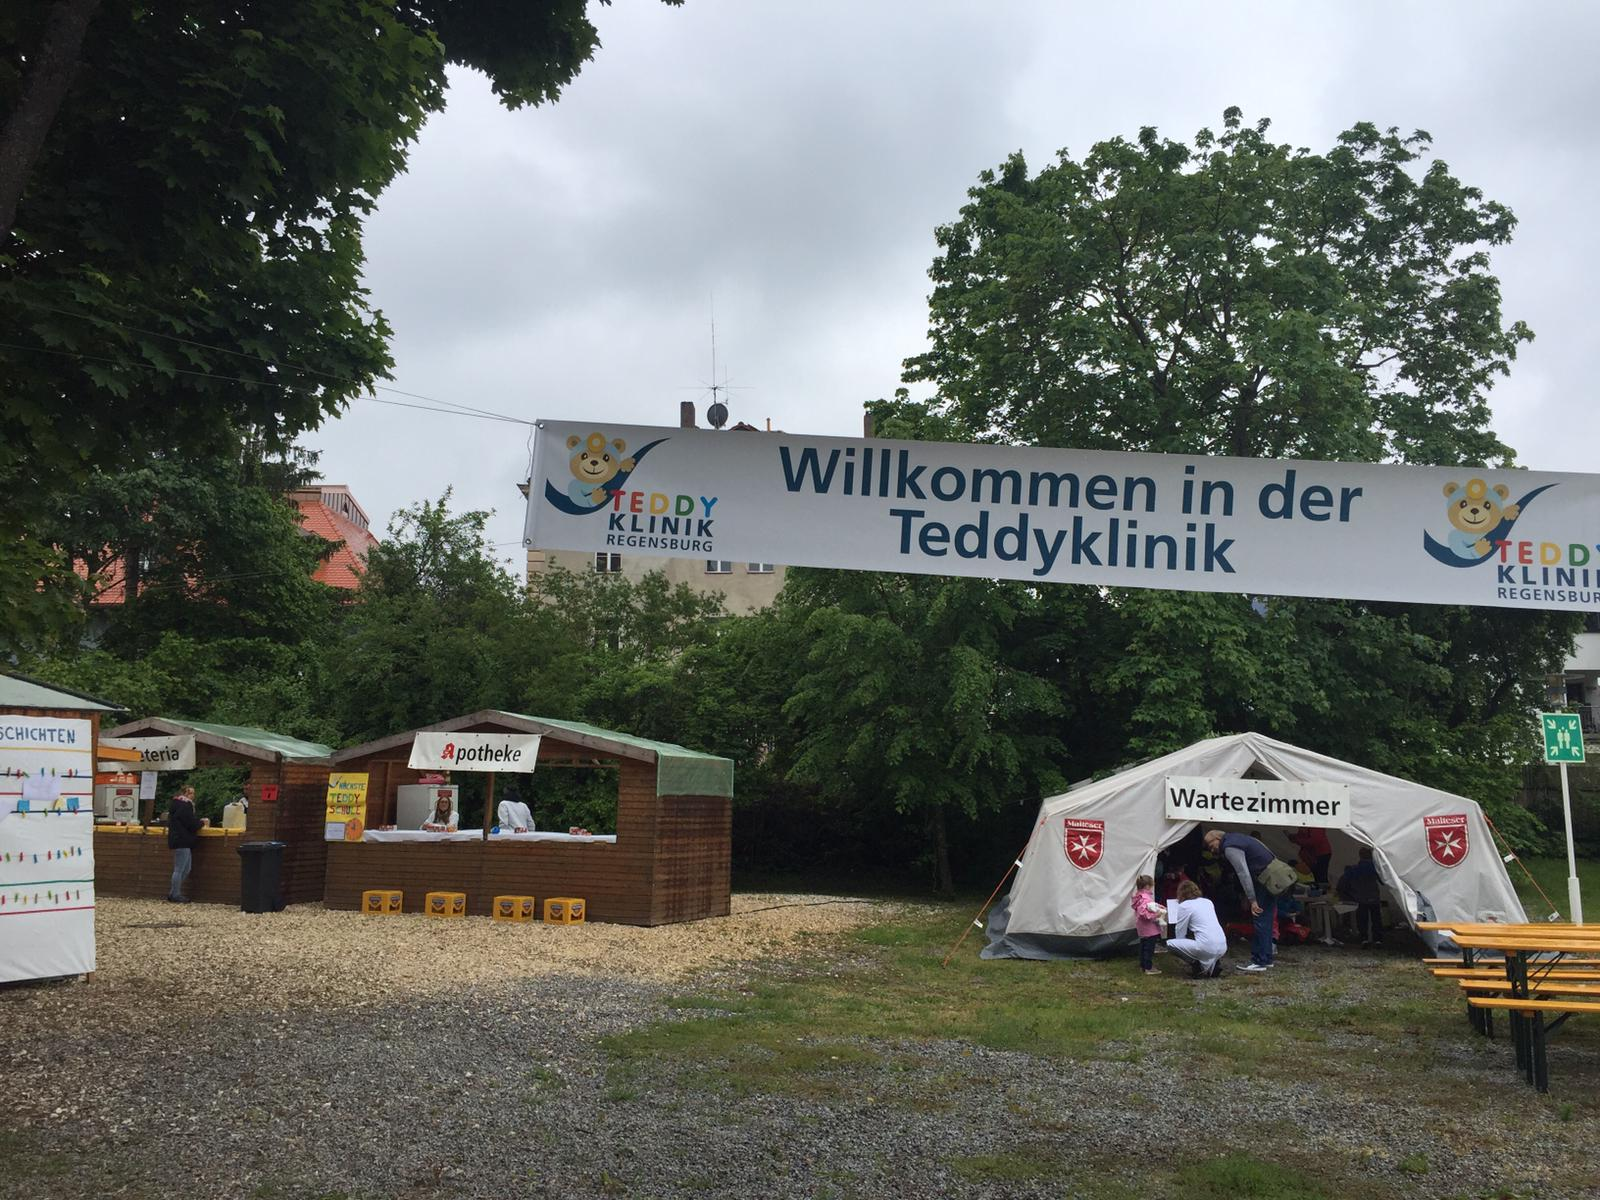 Teddyklinik Regensburg